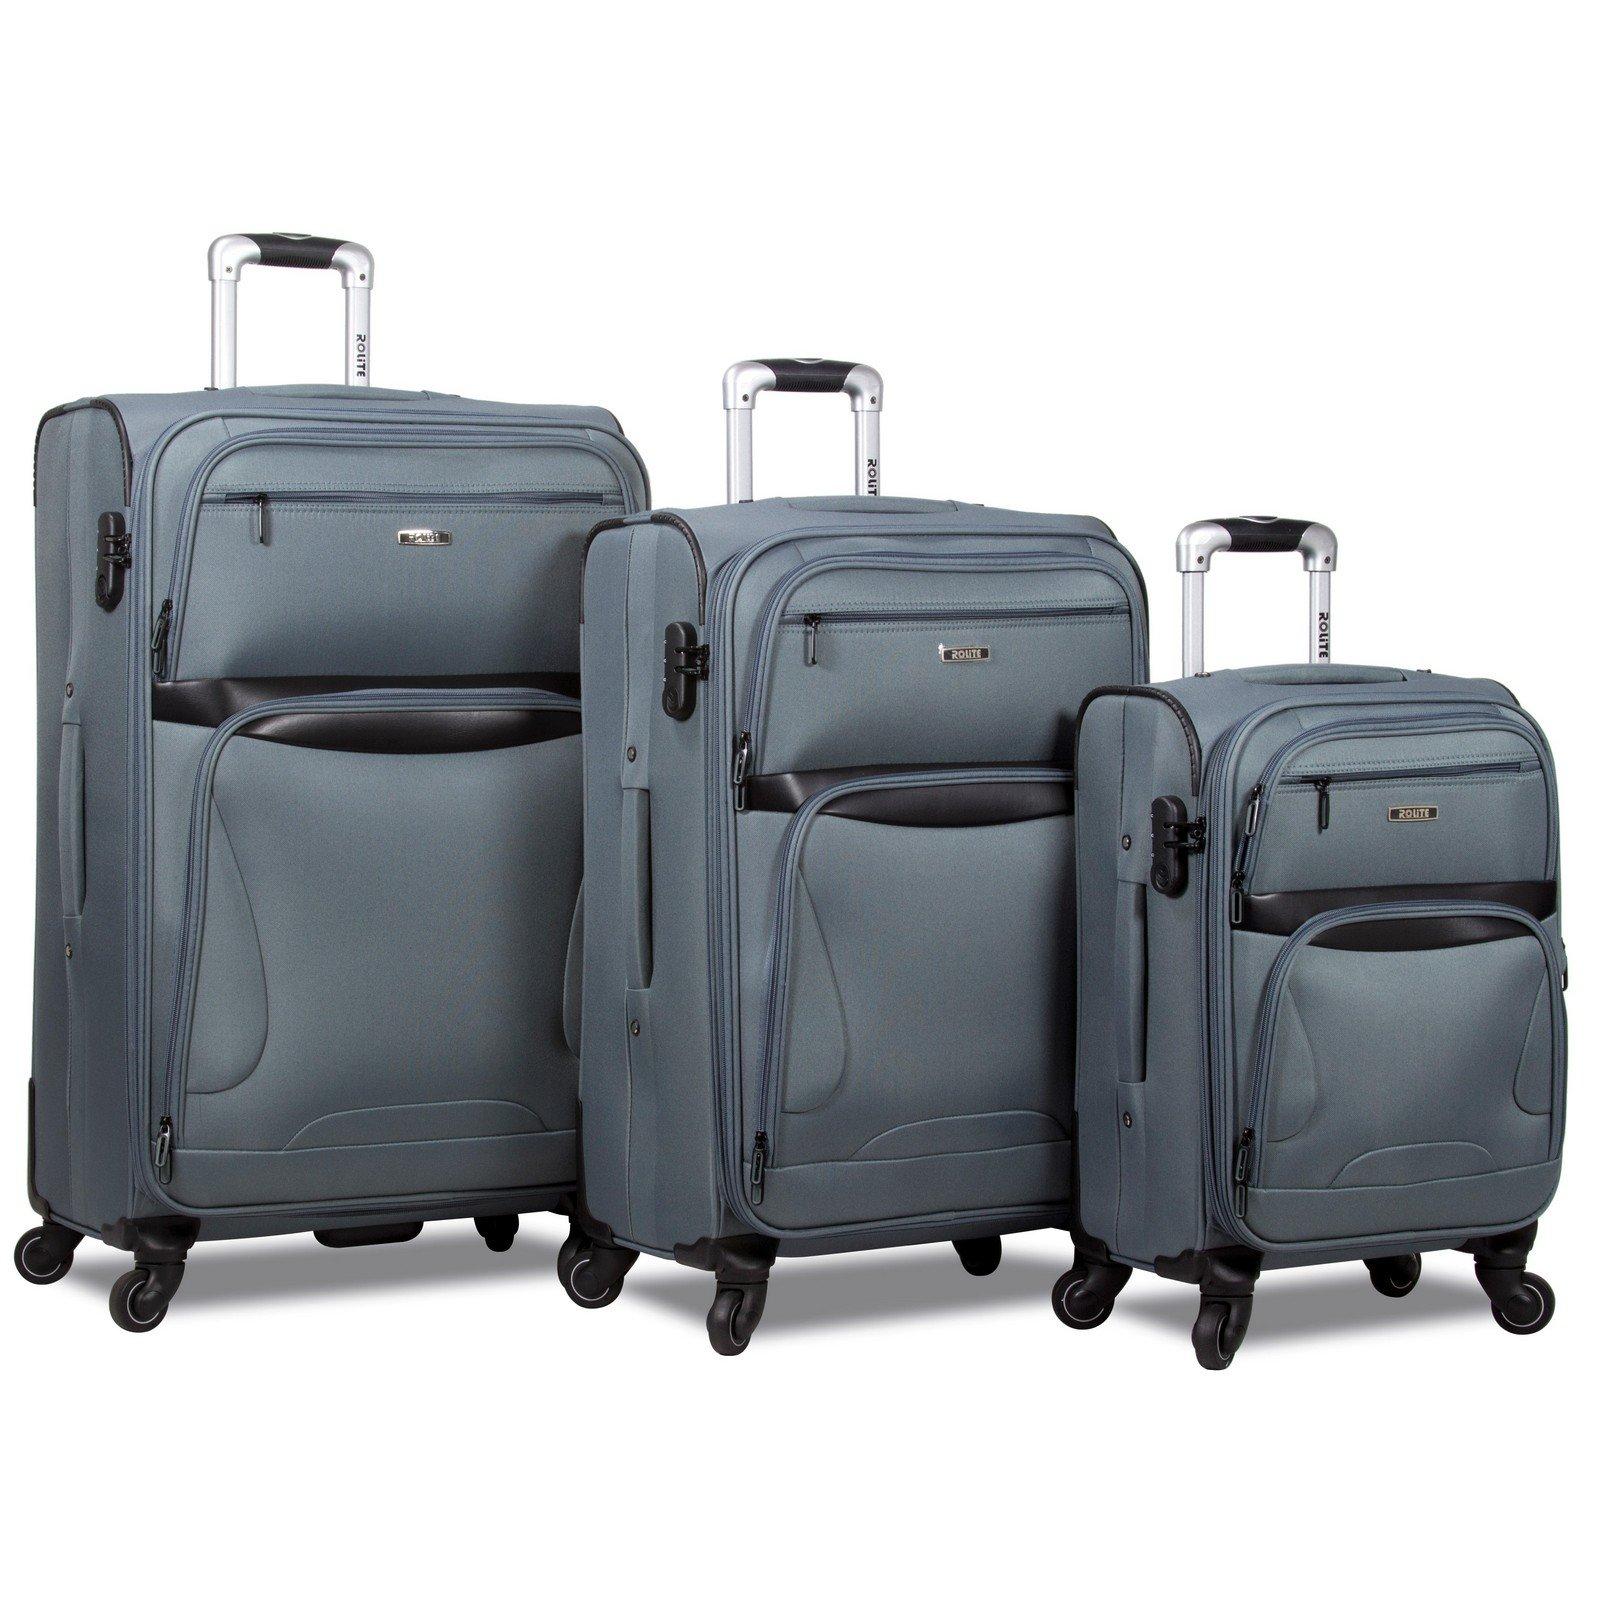 Rolite Explorer 3-Piece Expandable Spinner Luggage Set, Grey